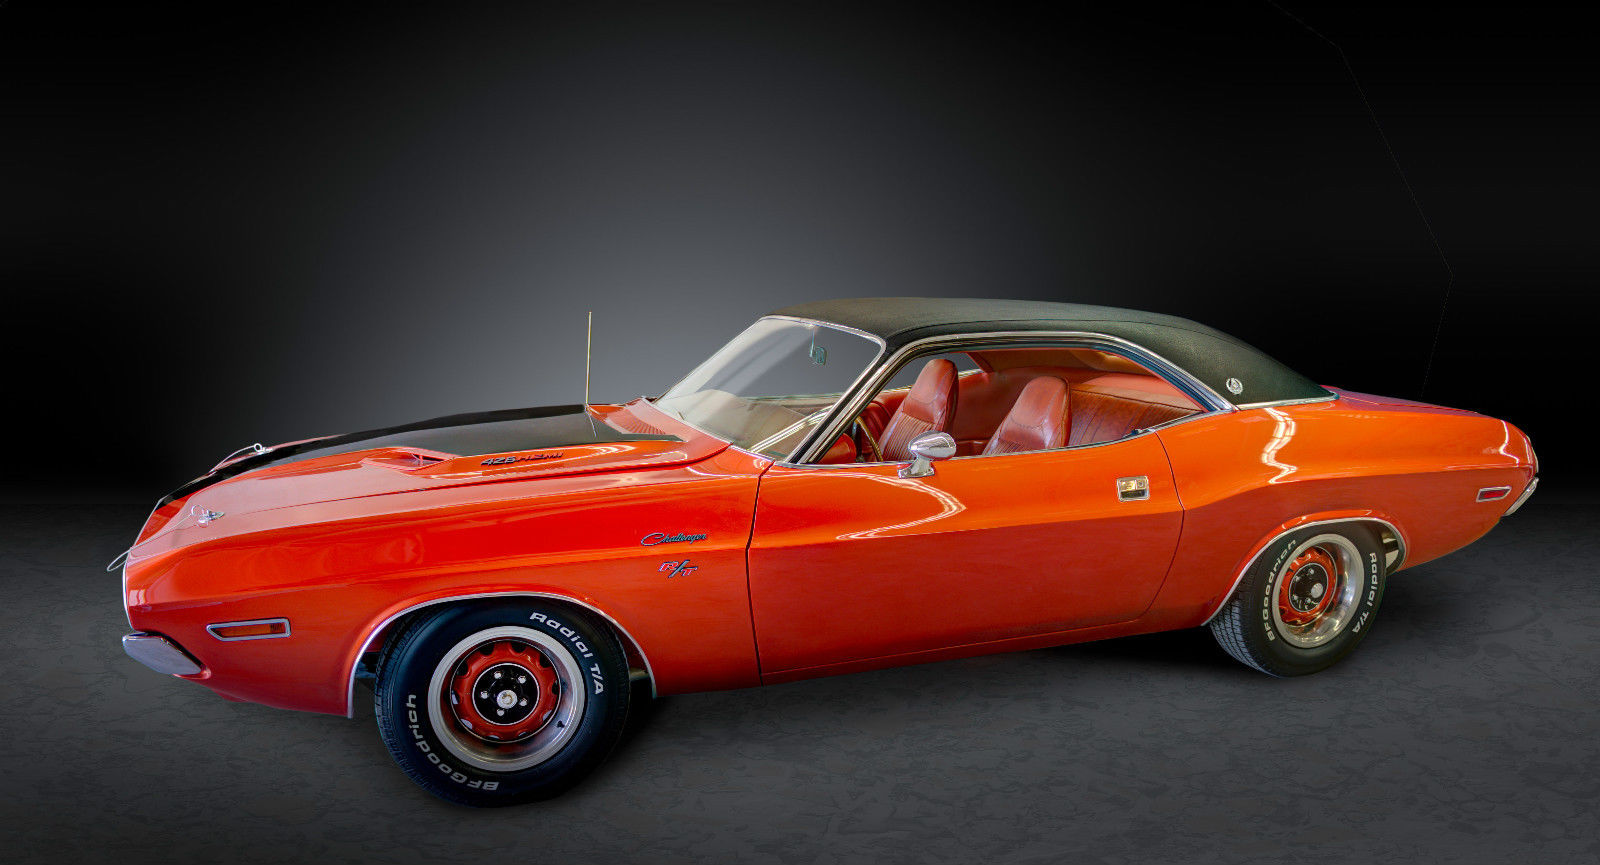 1970 Dodge Challenger RT 2 DR HT Spec Edition 426 Hemi Burnt Orange2